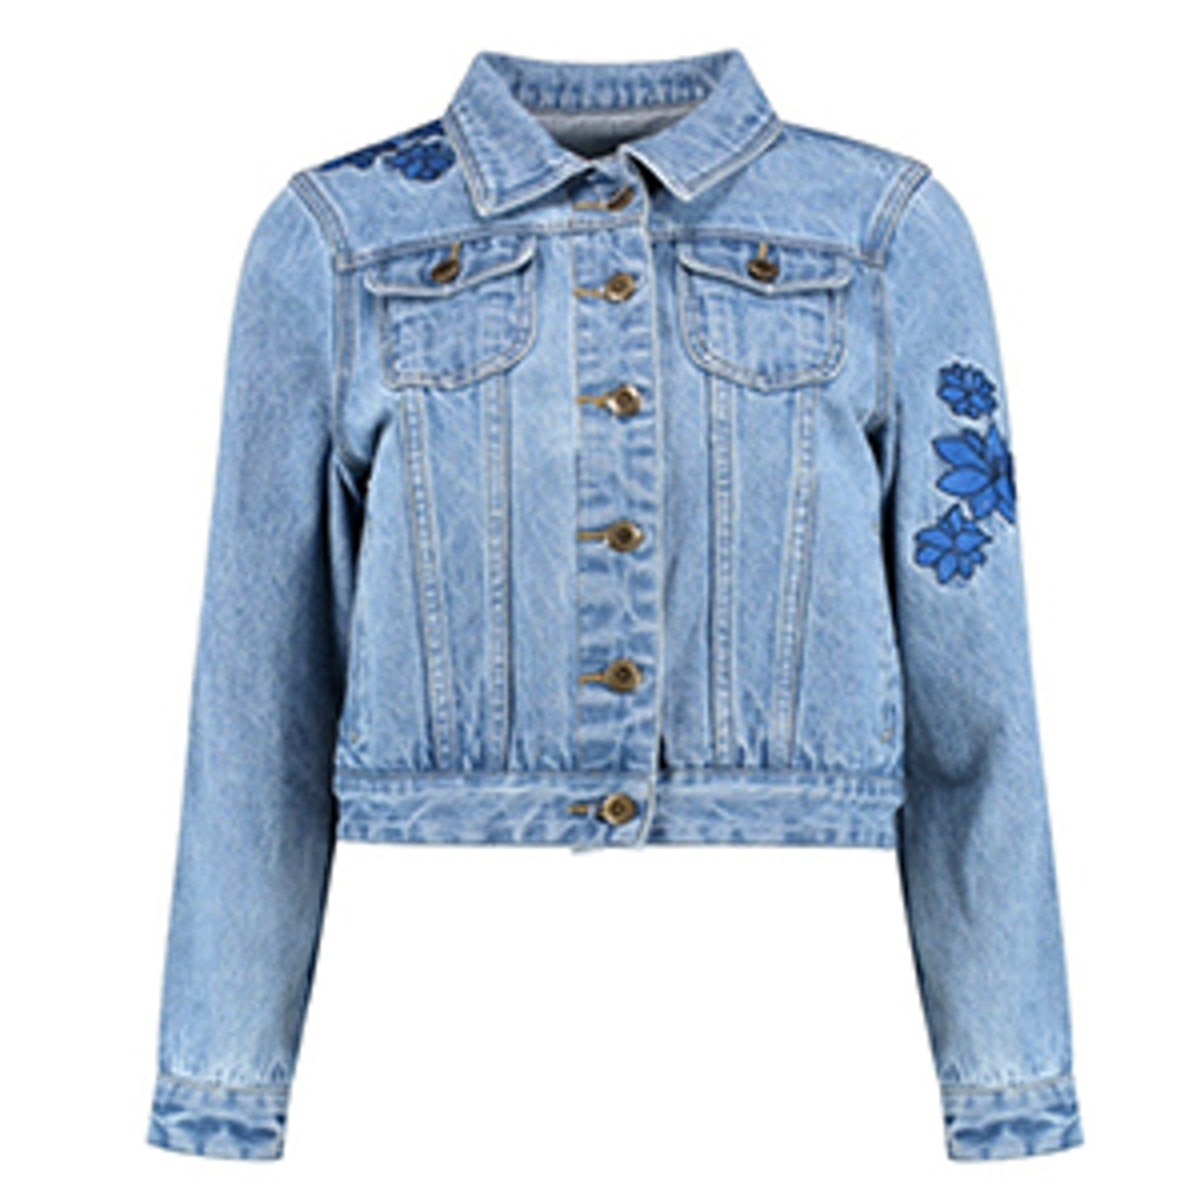 Sadie Embroidered Denim Jacket